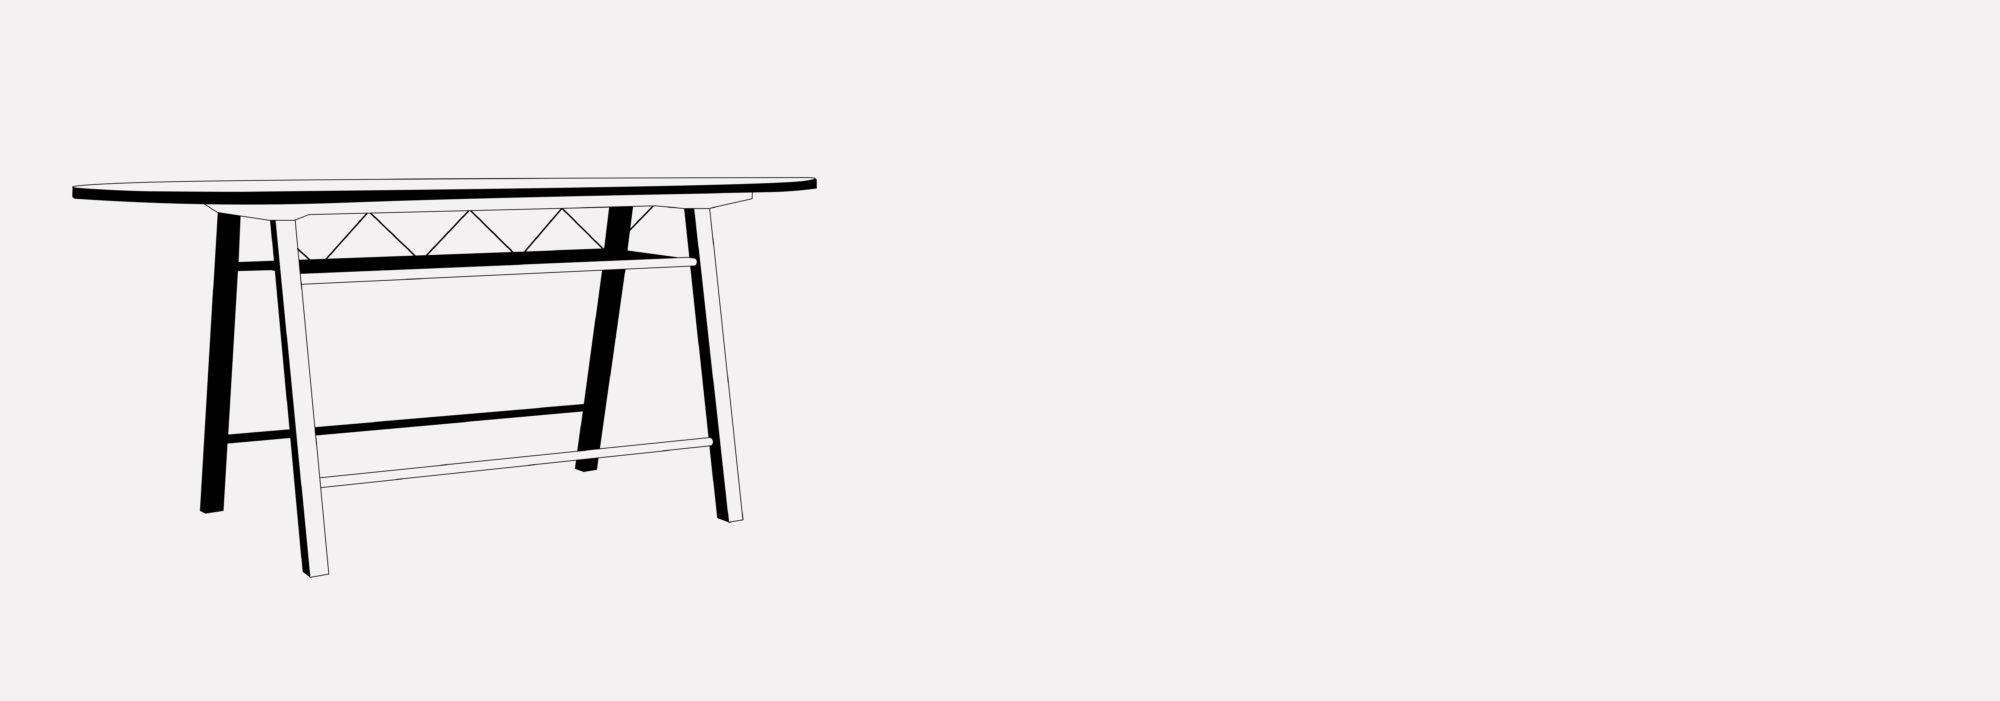 table wilson location slide nb